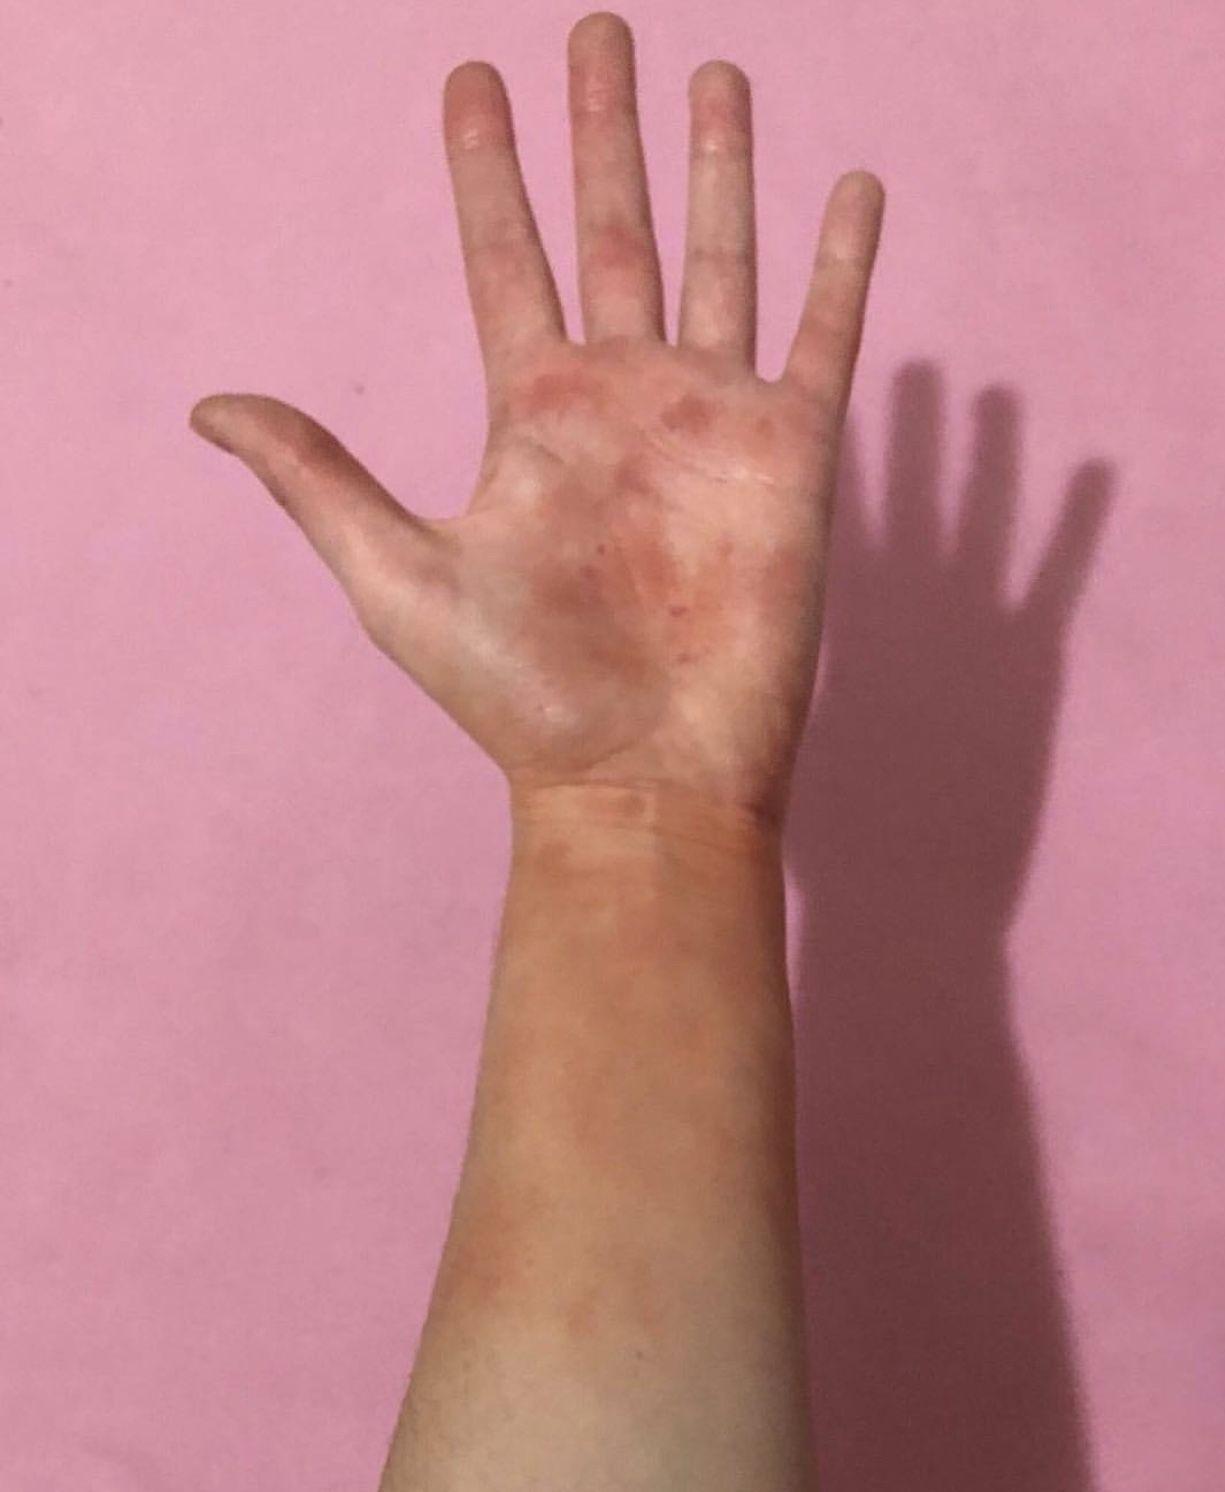 First Degree Burn | Makeup in 2019 | Burns, Hands